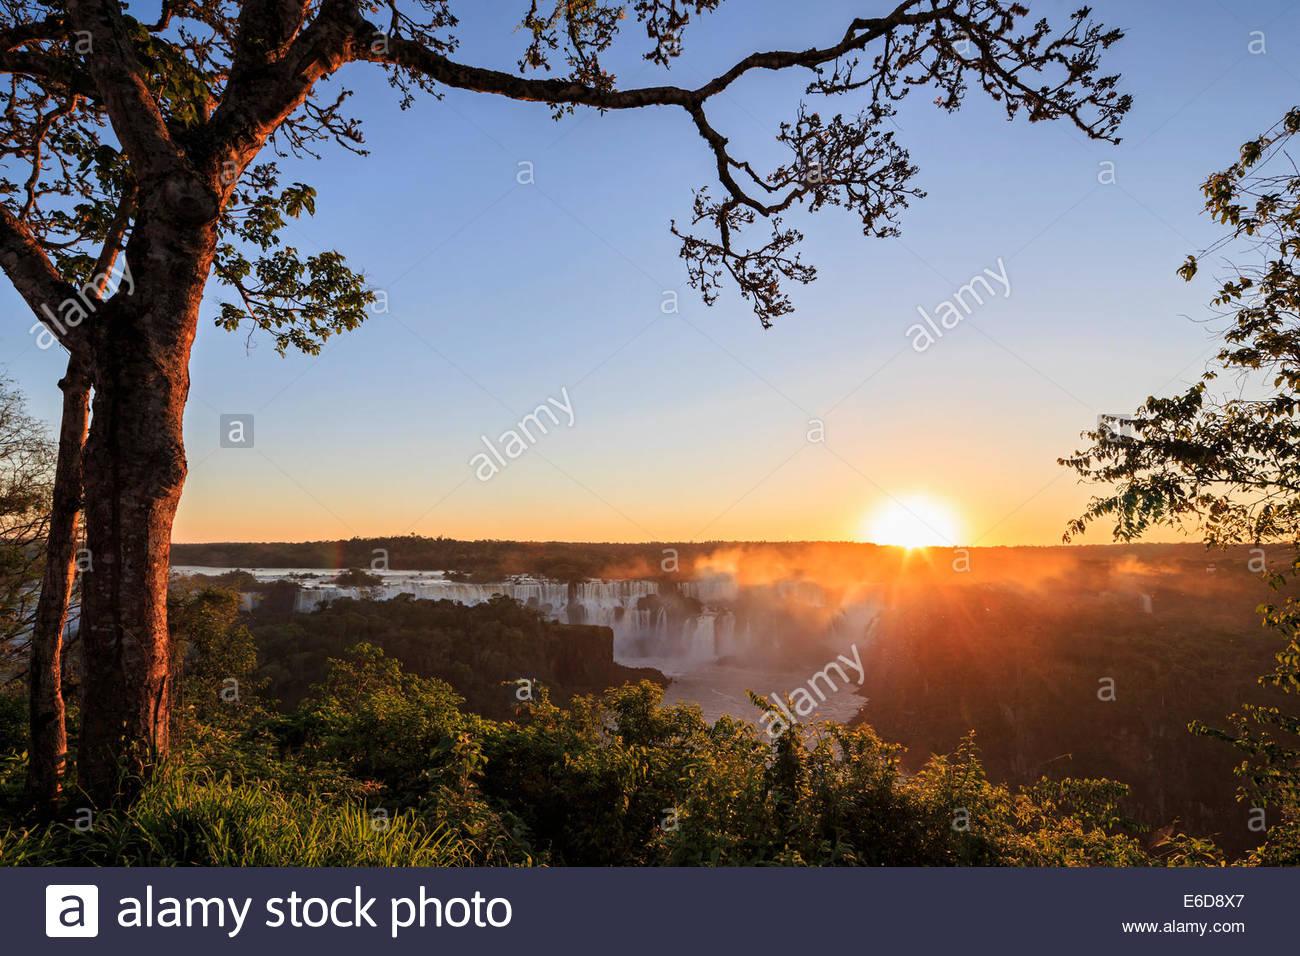 Südamerika, Brasilien, Parana, Iguazu Nationalpark Iguazu Falls gegen die Abendsonne Stockbild